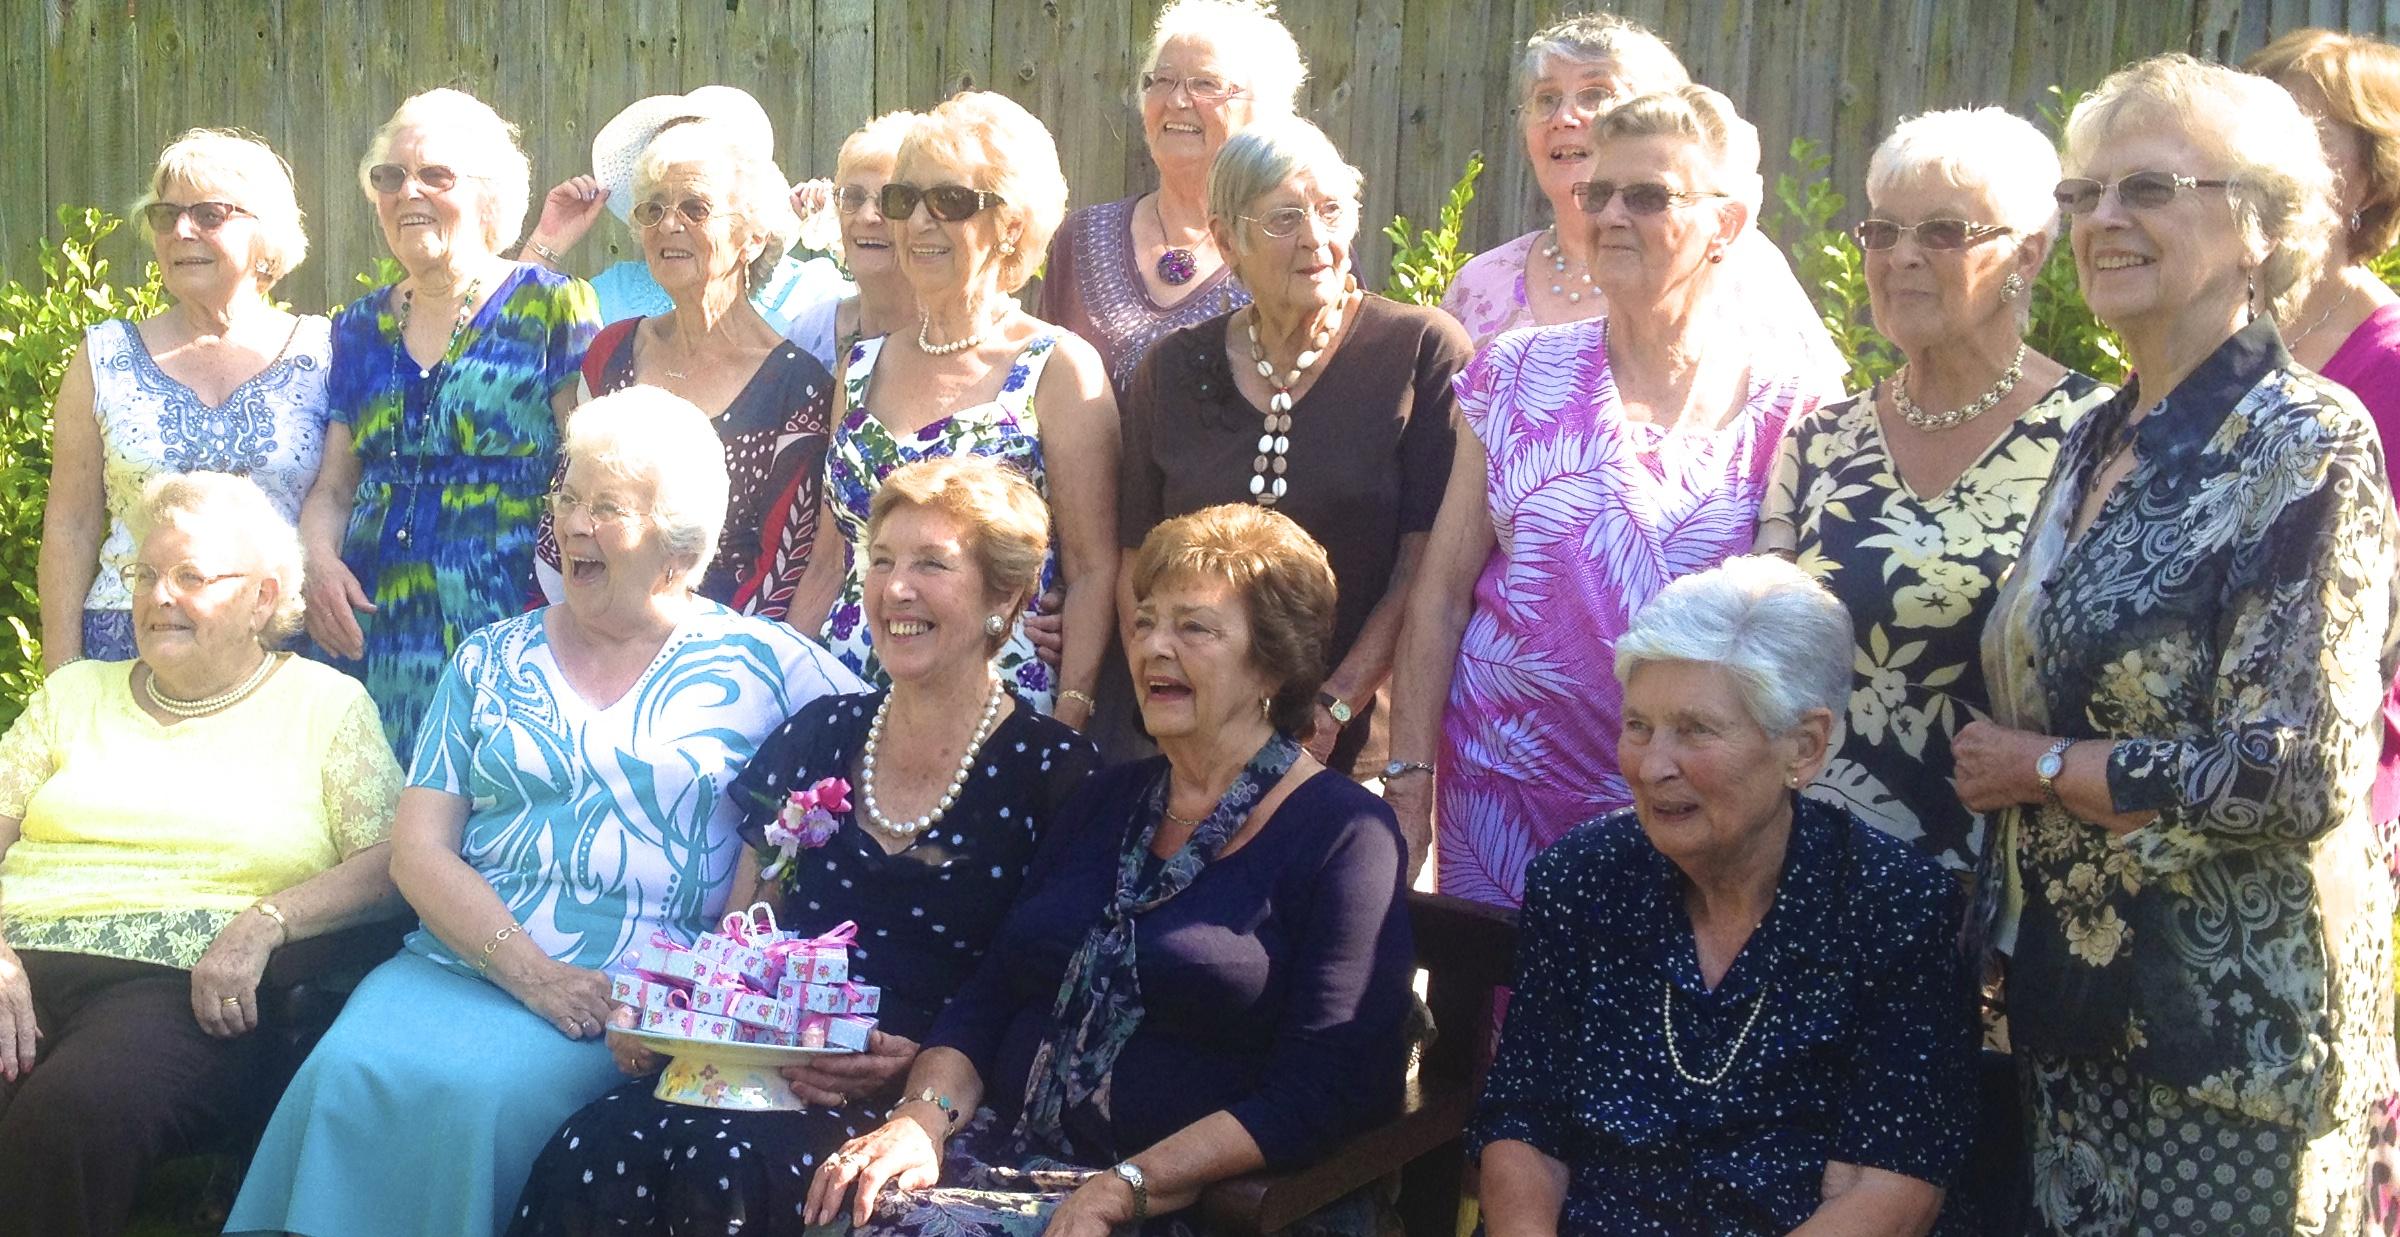 Group Of Older Women 81